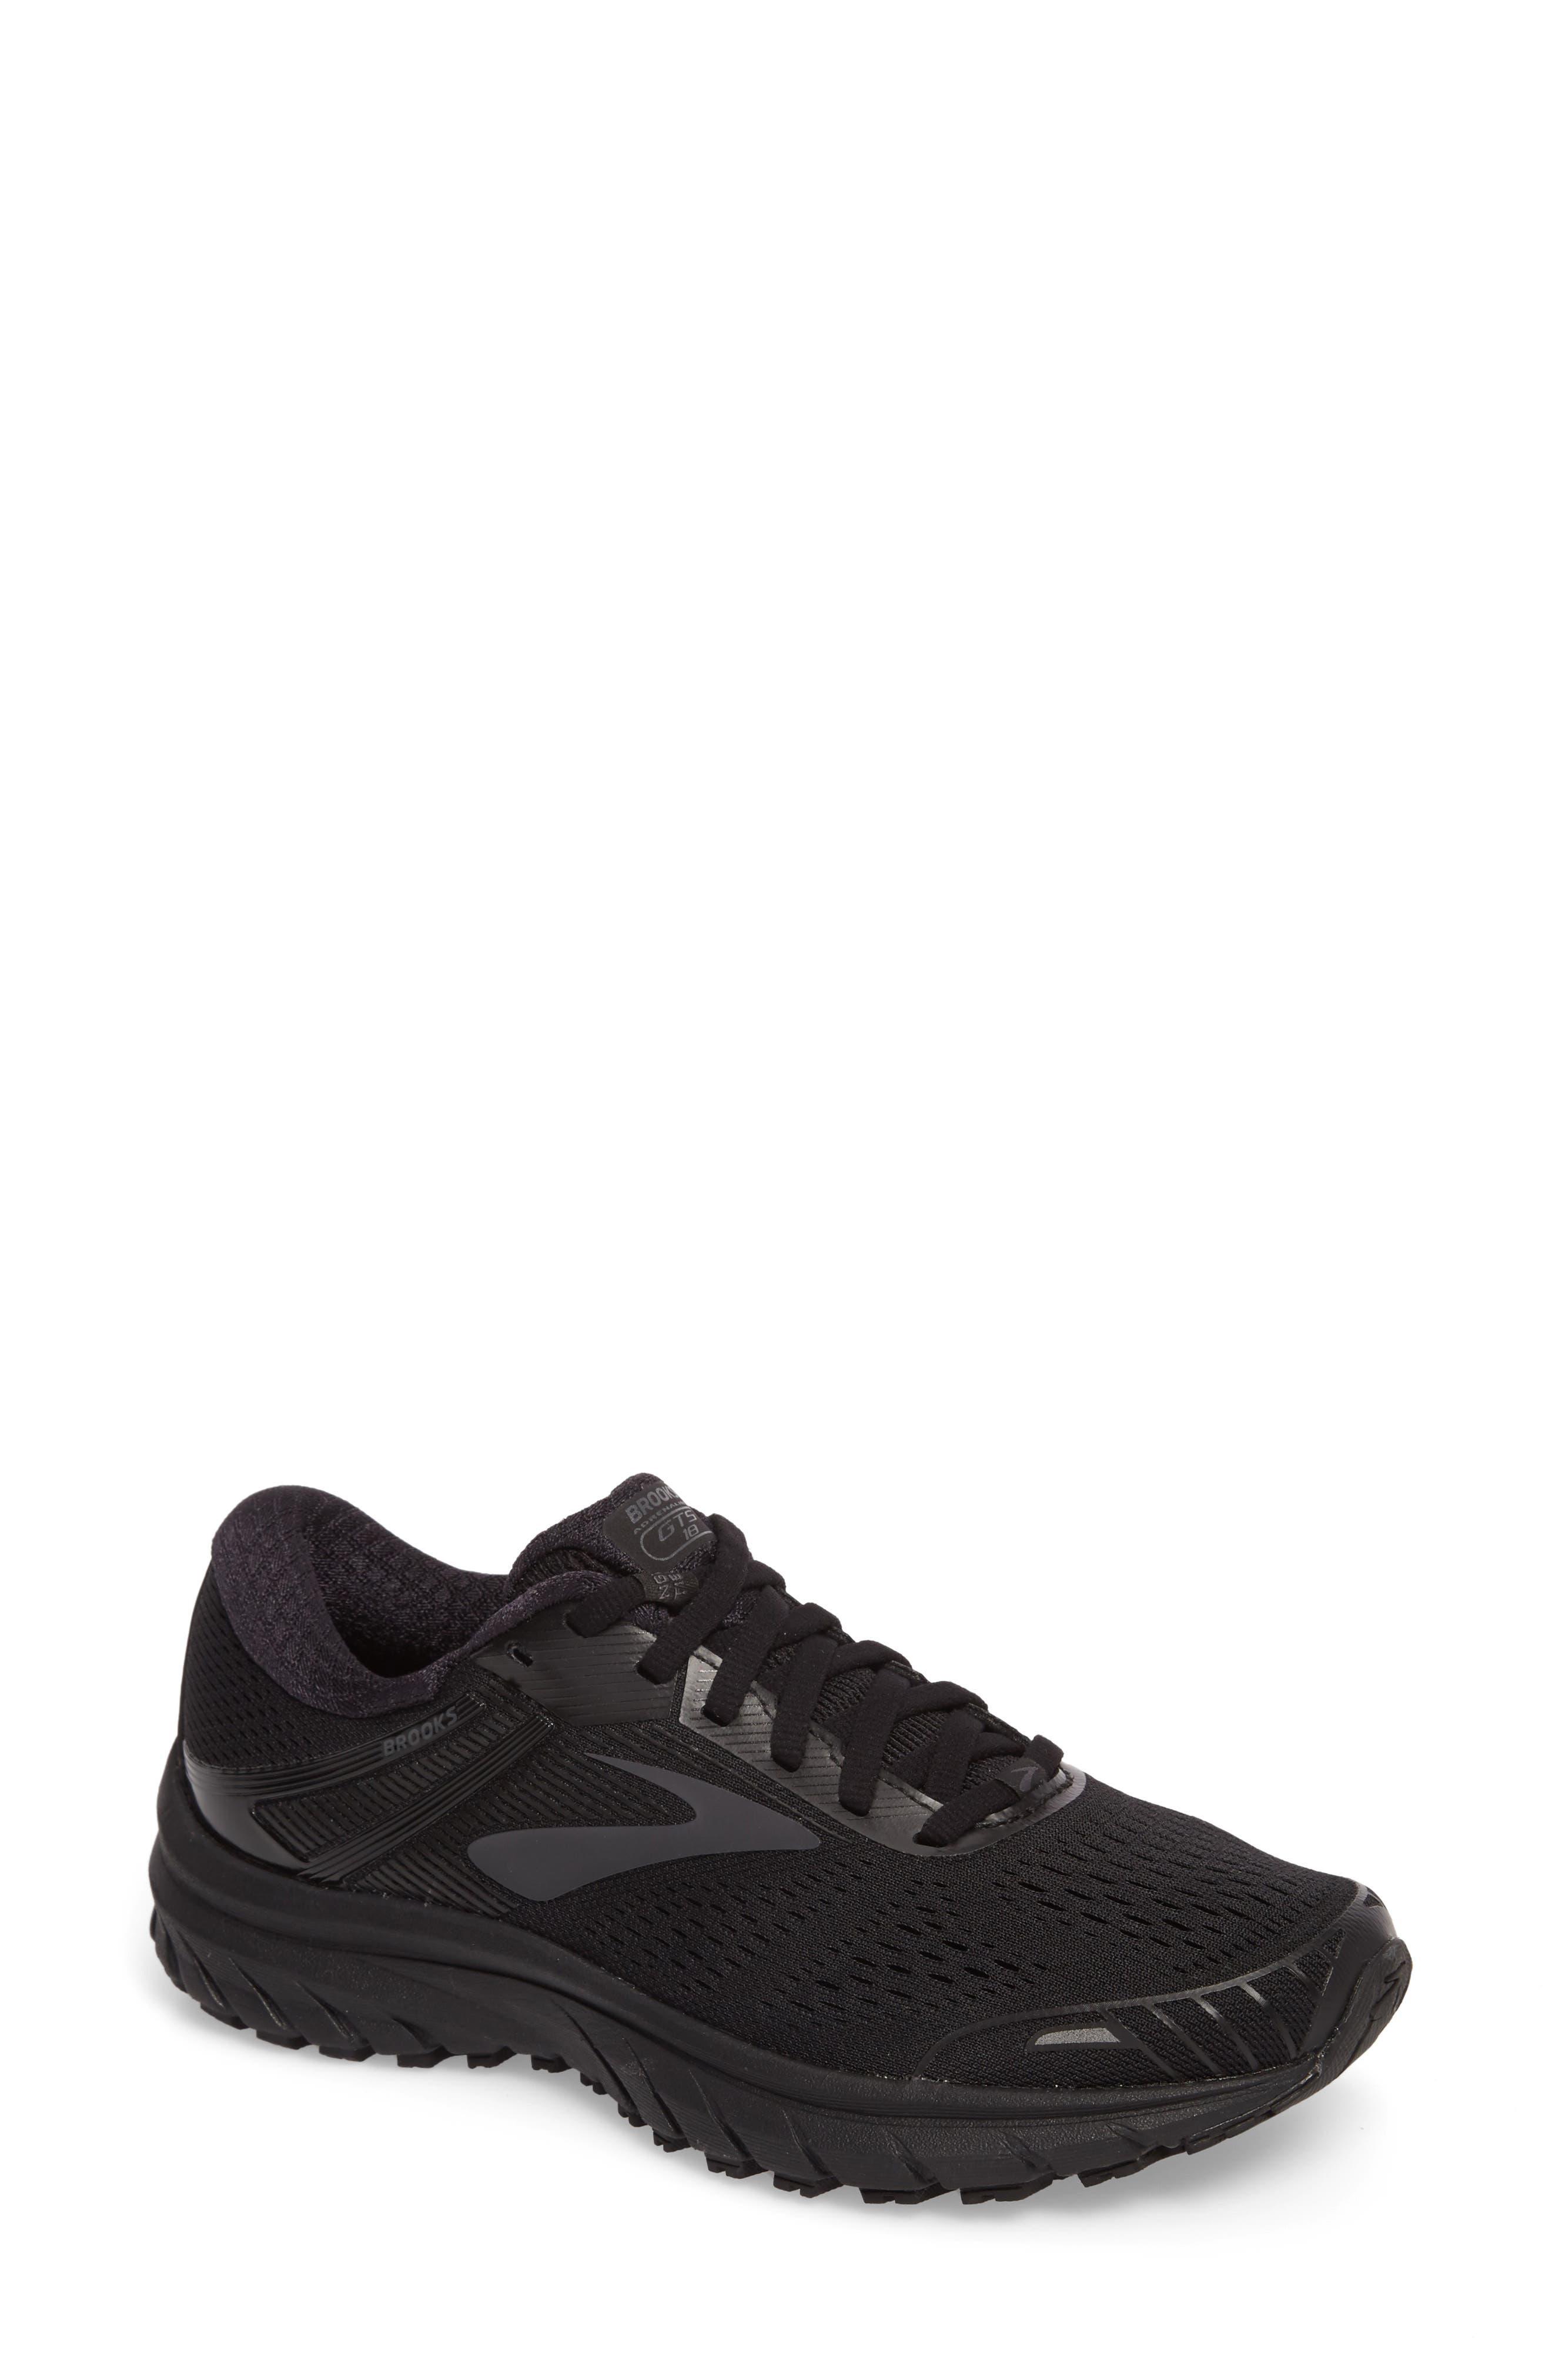 Adrenaline GTS 18 Running Shoe,                             Main thumbnail 1, color,                             BLACK/ BLACK